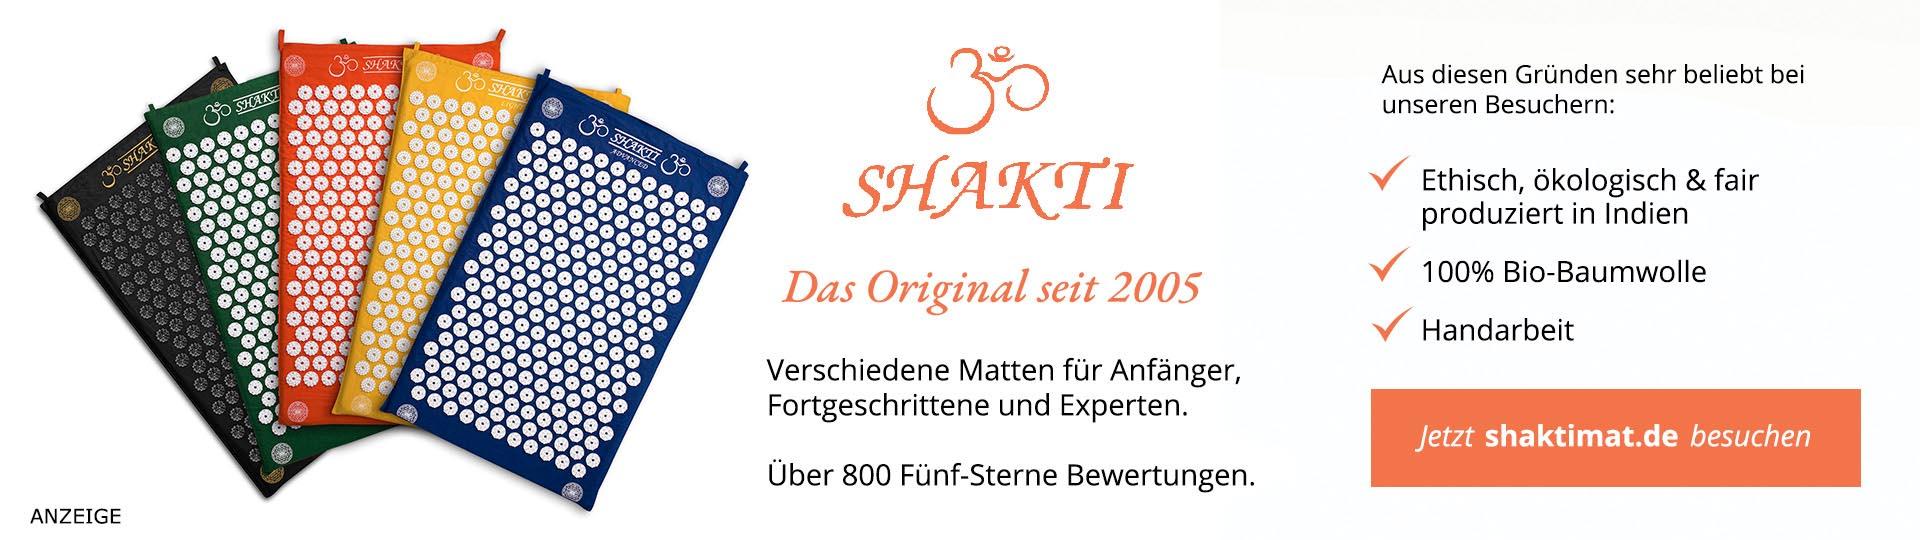 Shaktimat-Werbung-Main-tagged